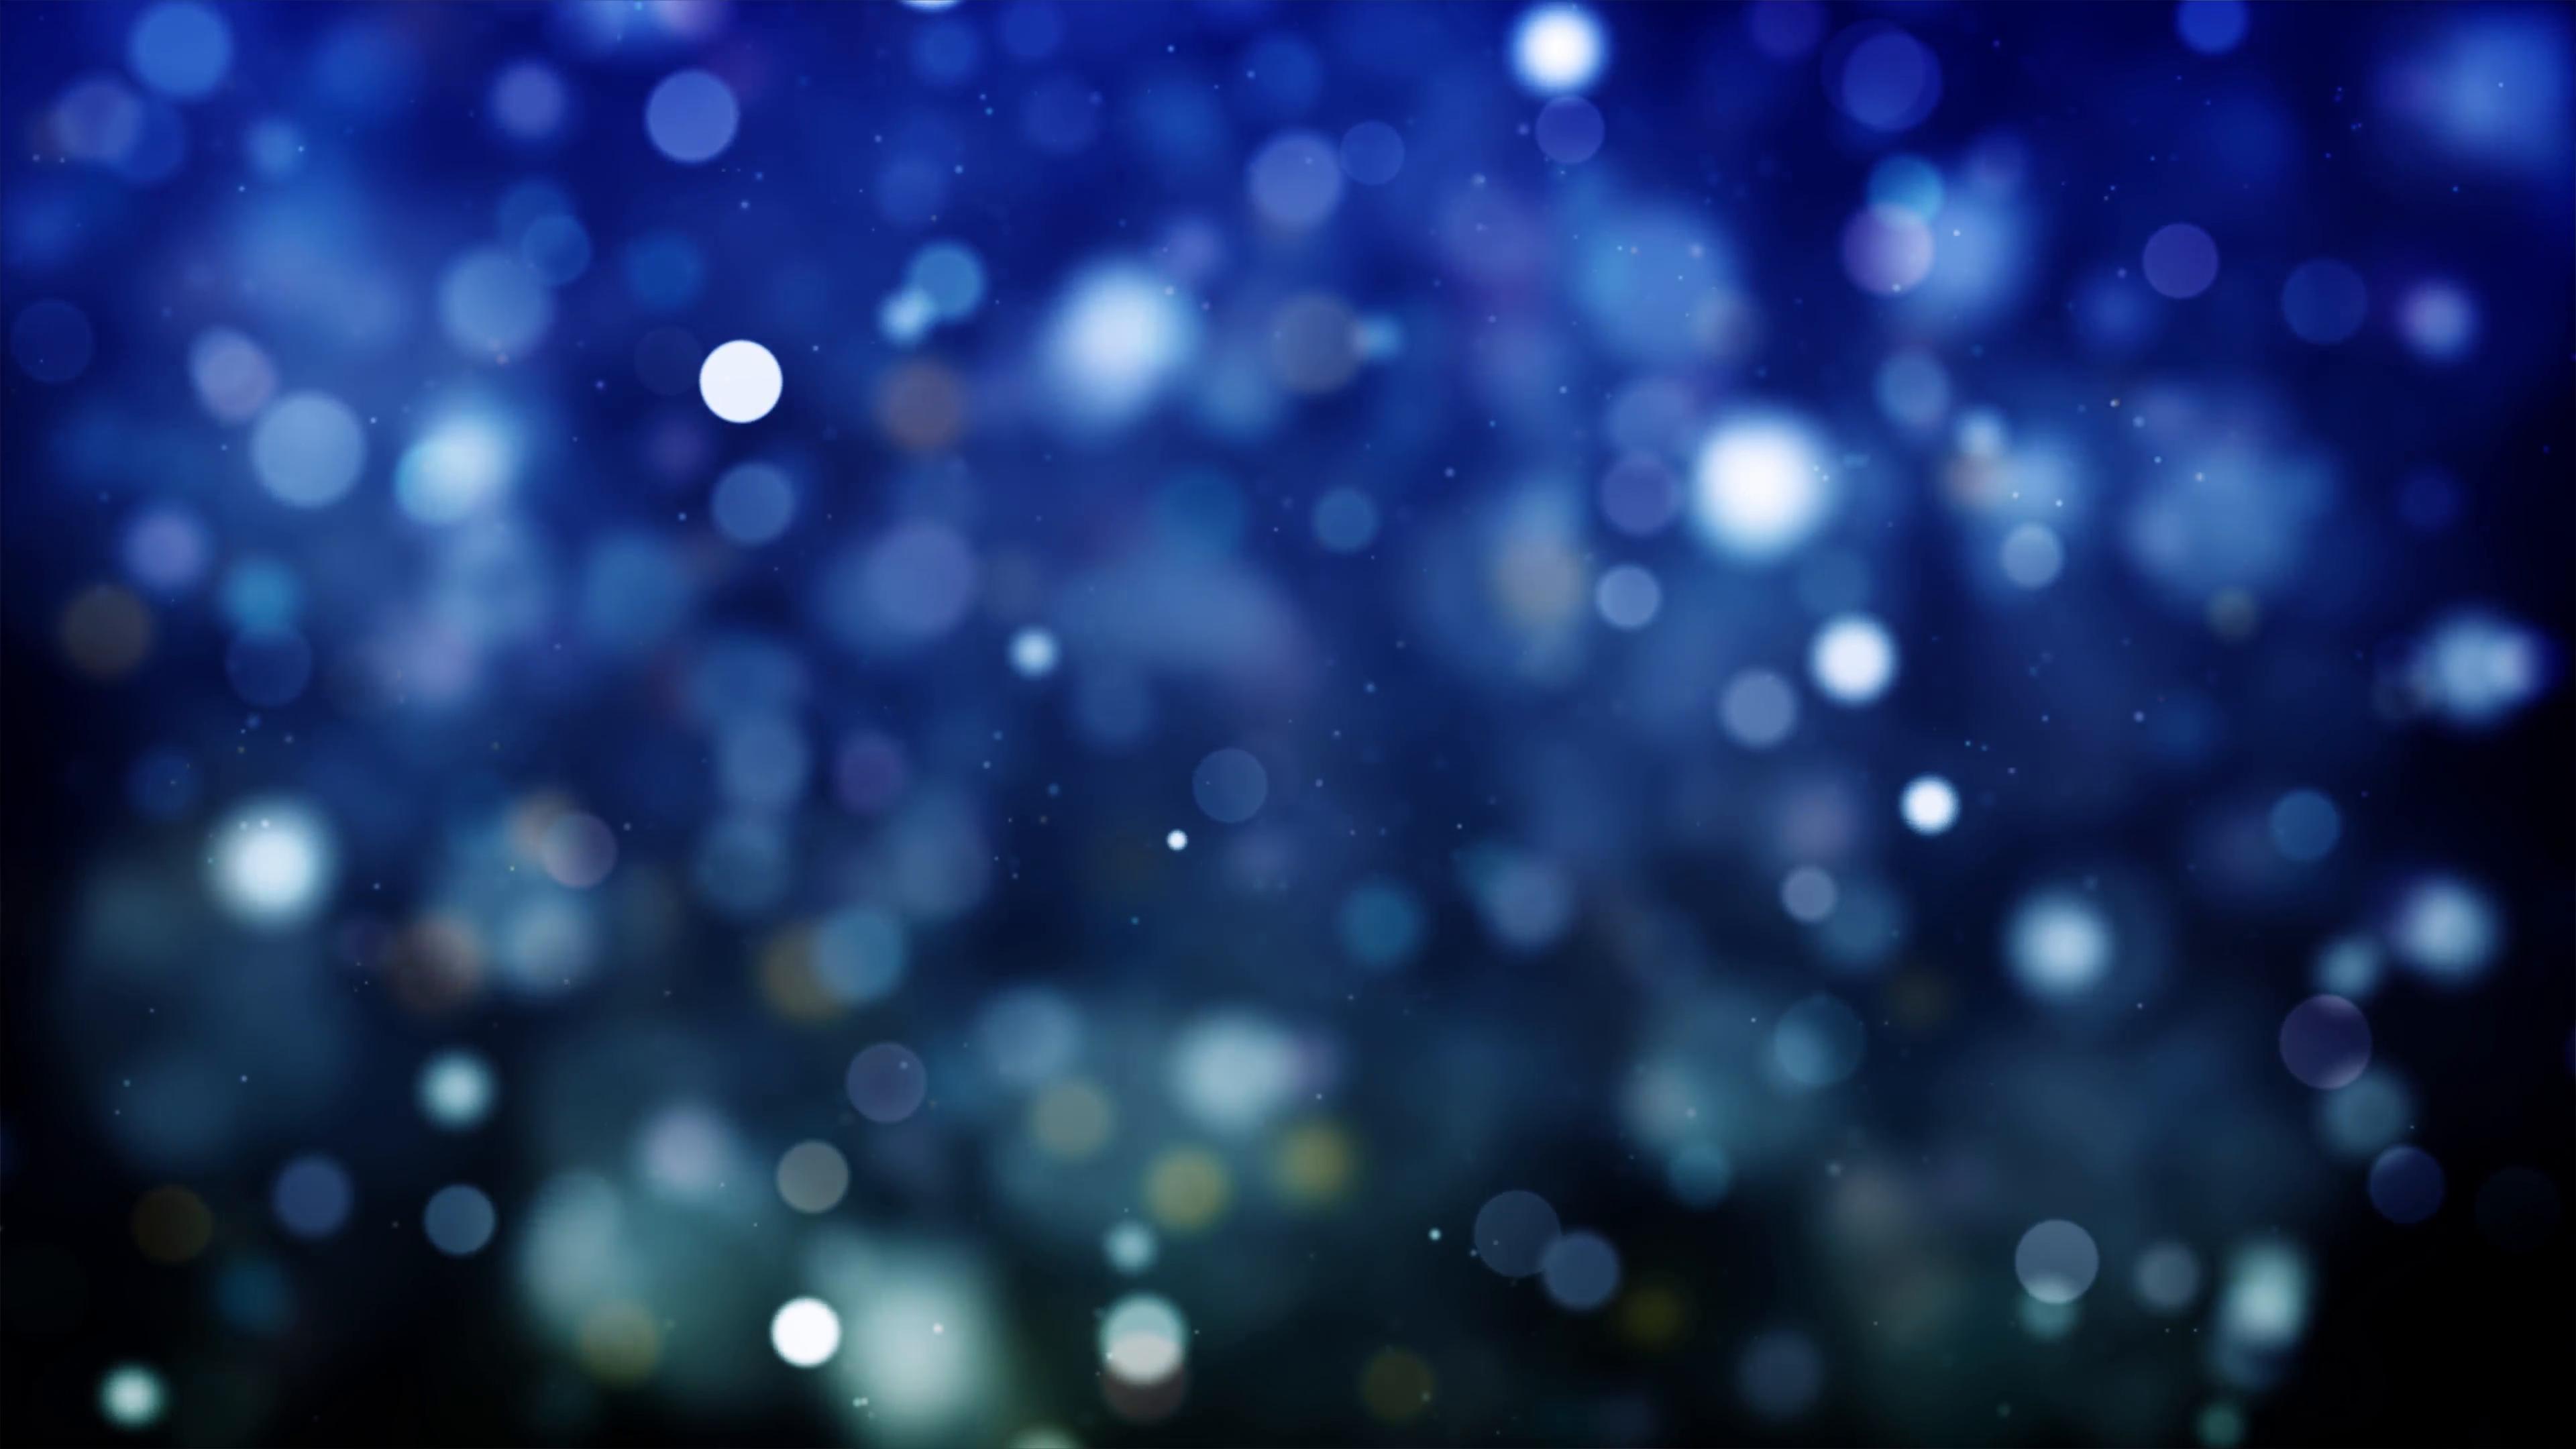 Free photo: Blue Bokeh Blur - Abstract, Blue, Blur - Free ...